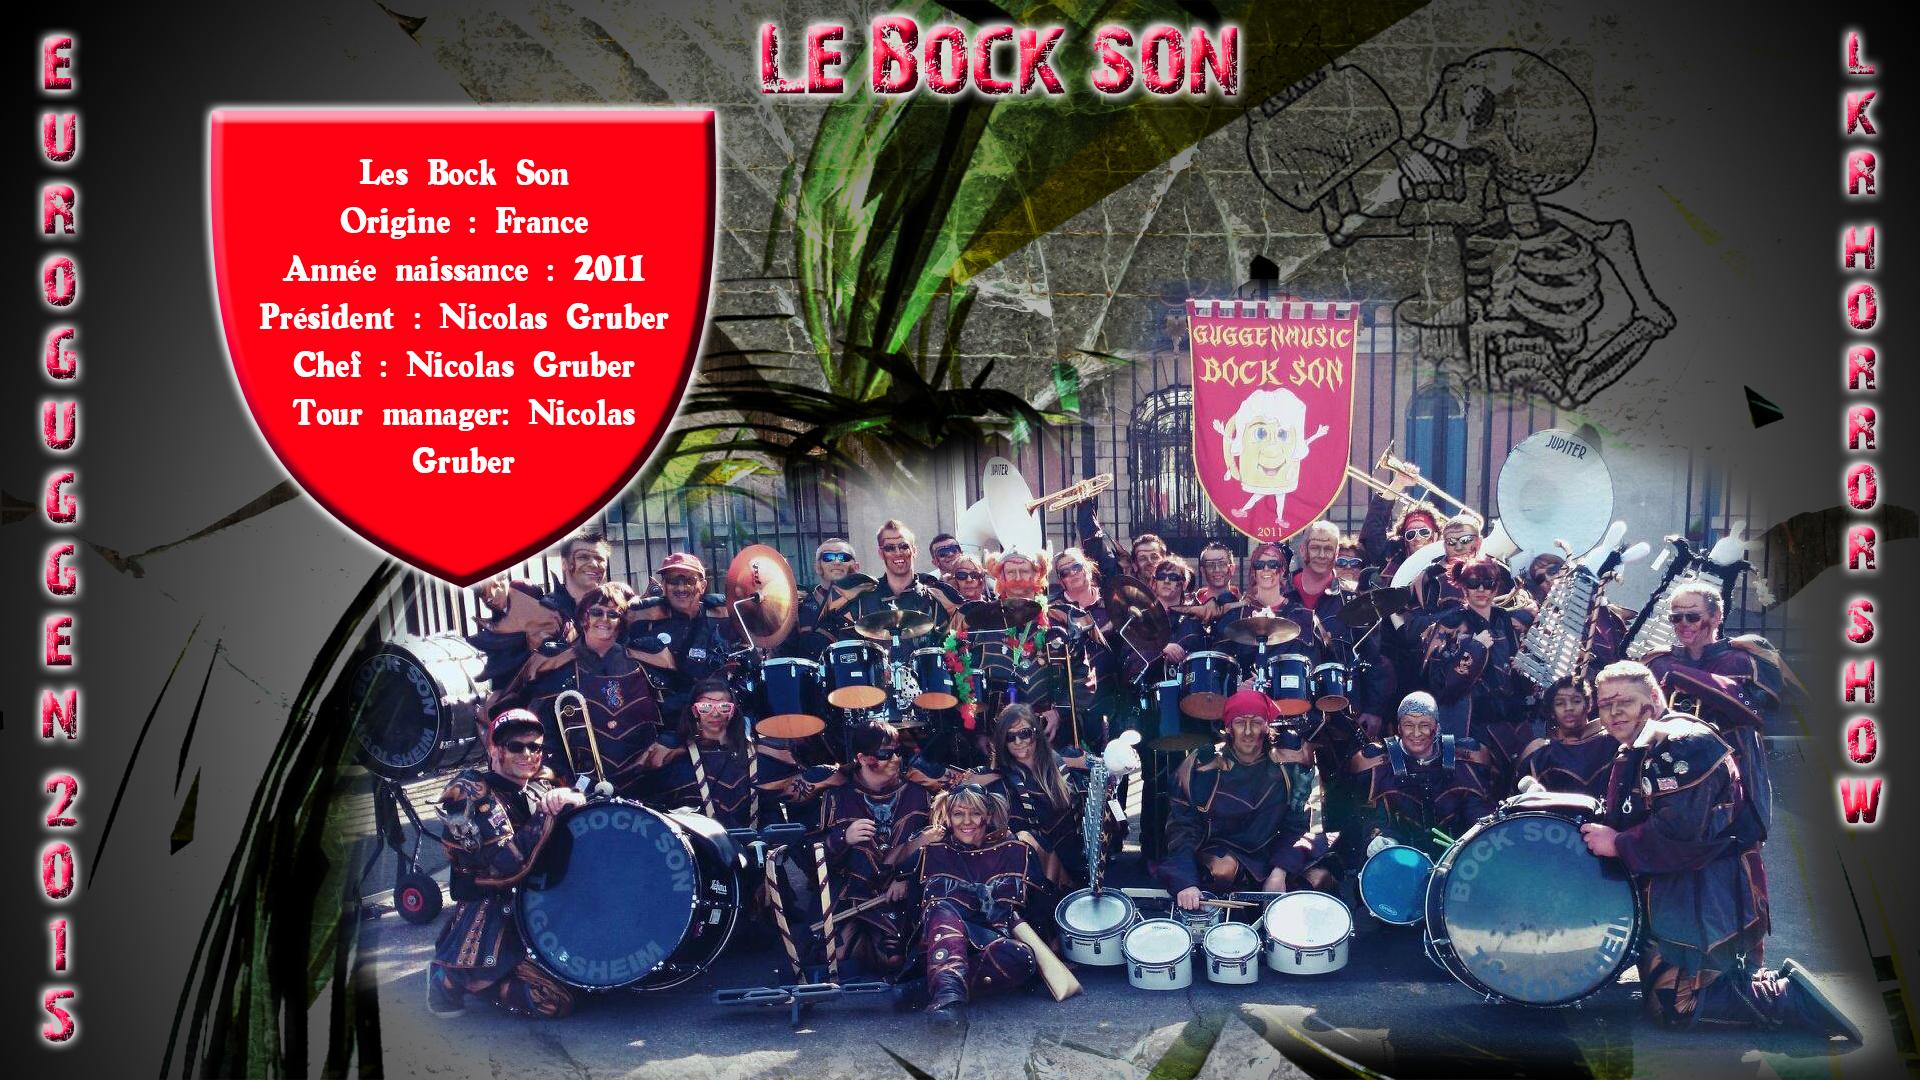 Les Bock Son Affiche.jpg